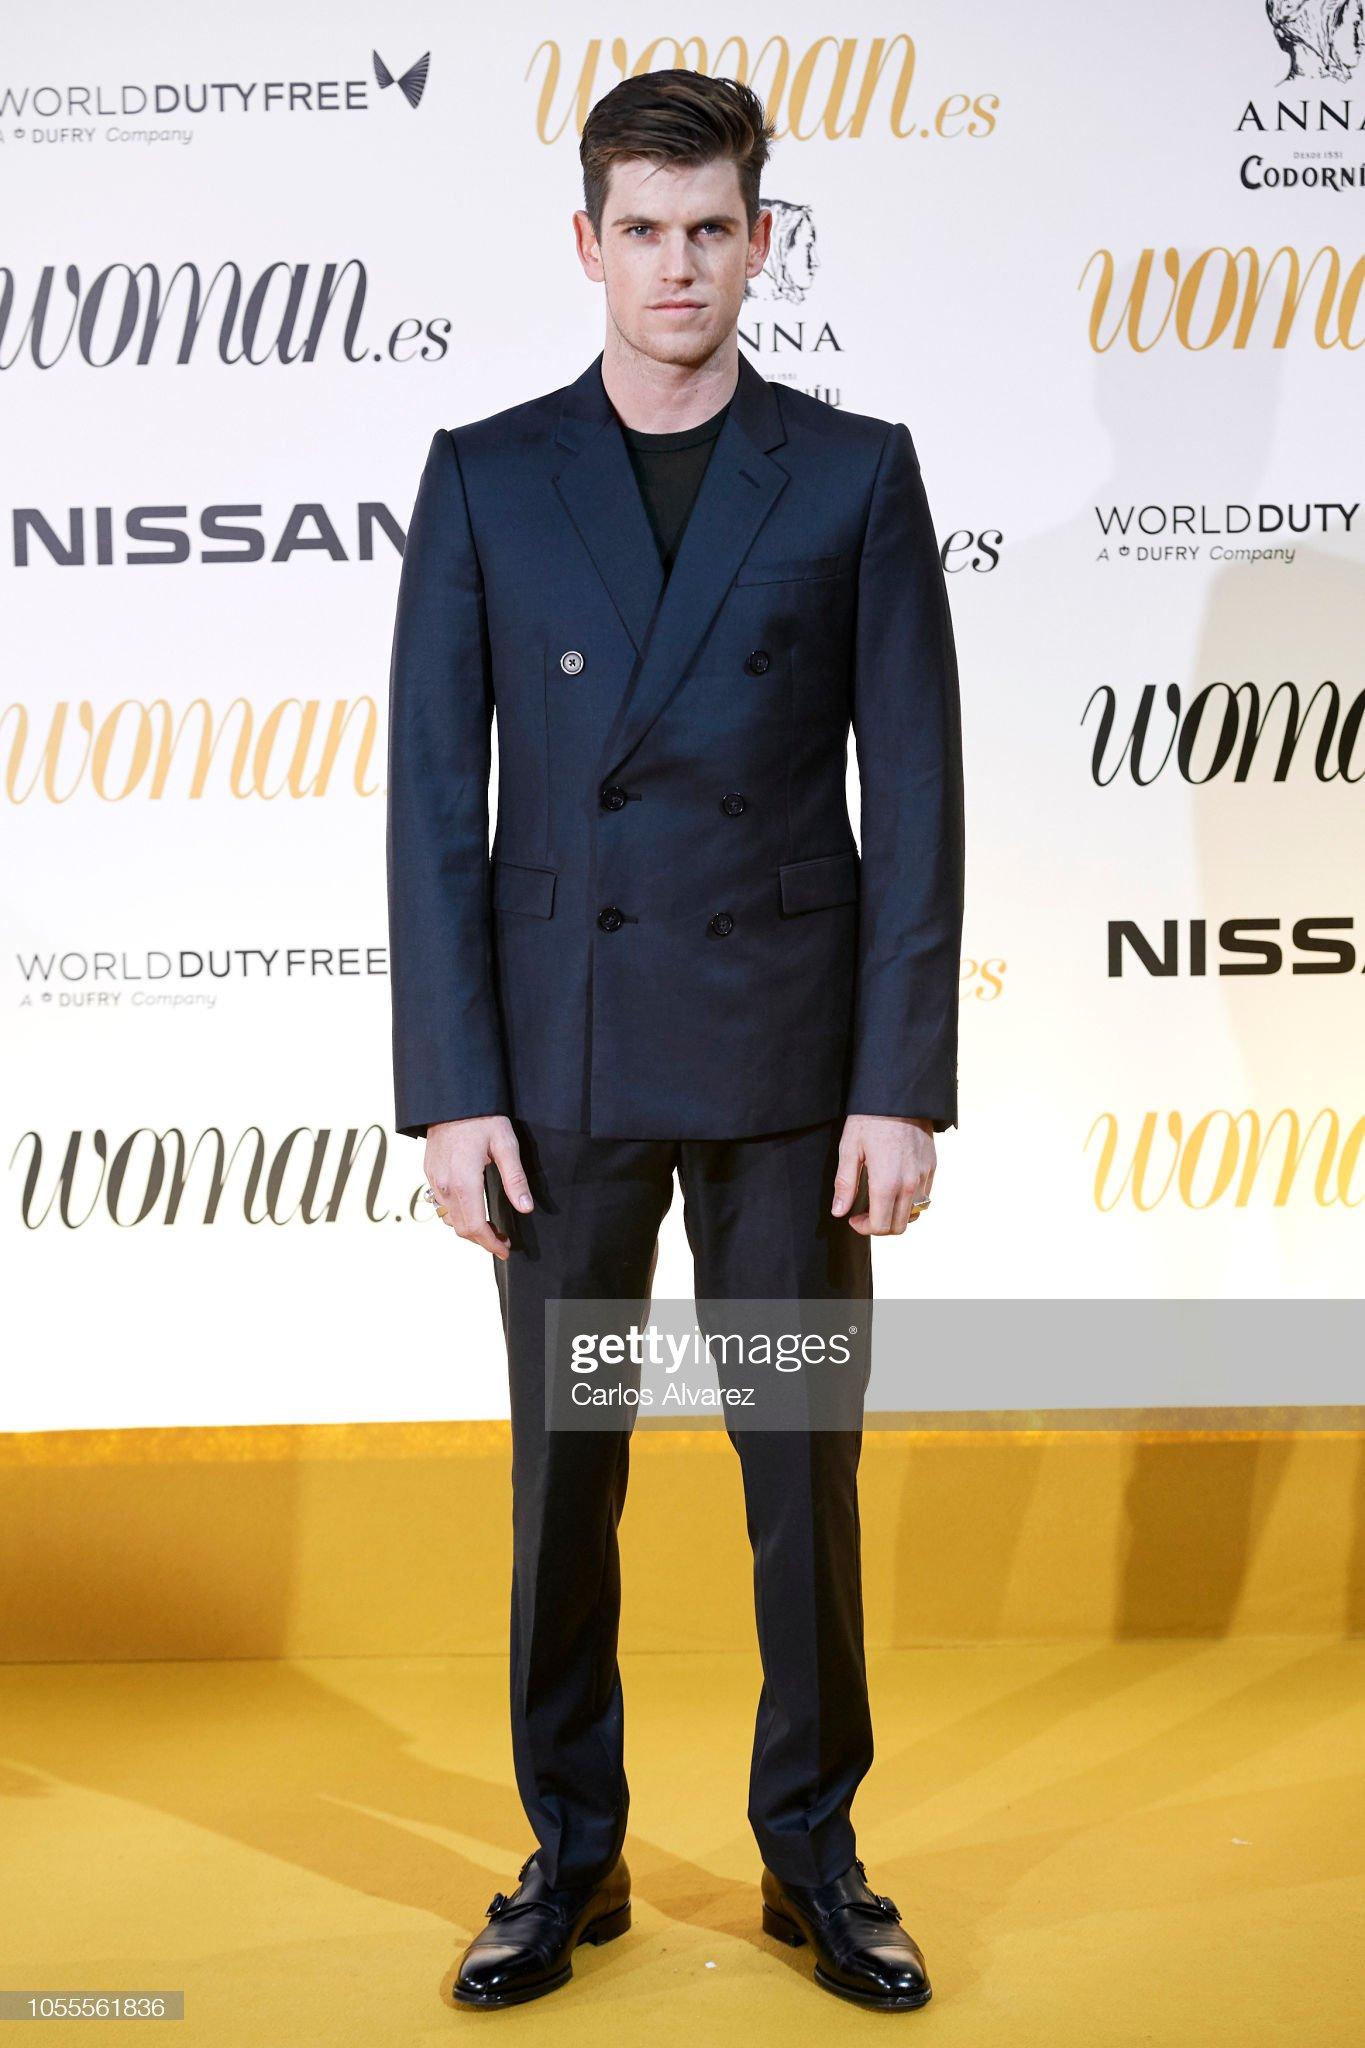 ¿Cuánto mide Miguel Bernardeau?  - Altura: 1,79 Actor-miguel-bernardeau-attends-woman-awards-2018-at-the-casino-de-picture-id1055561836?s=2048x2048